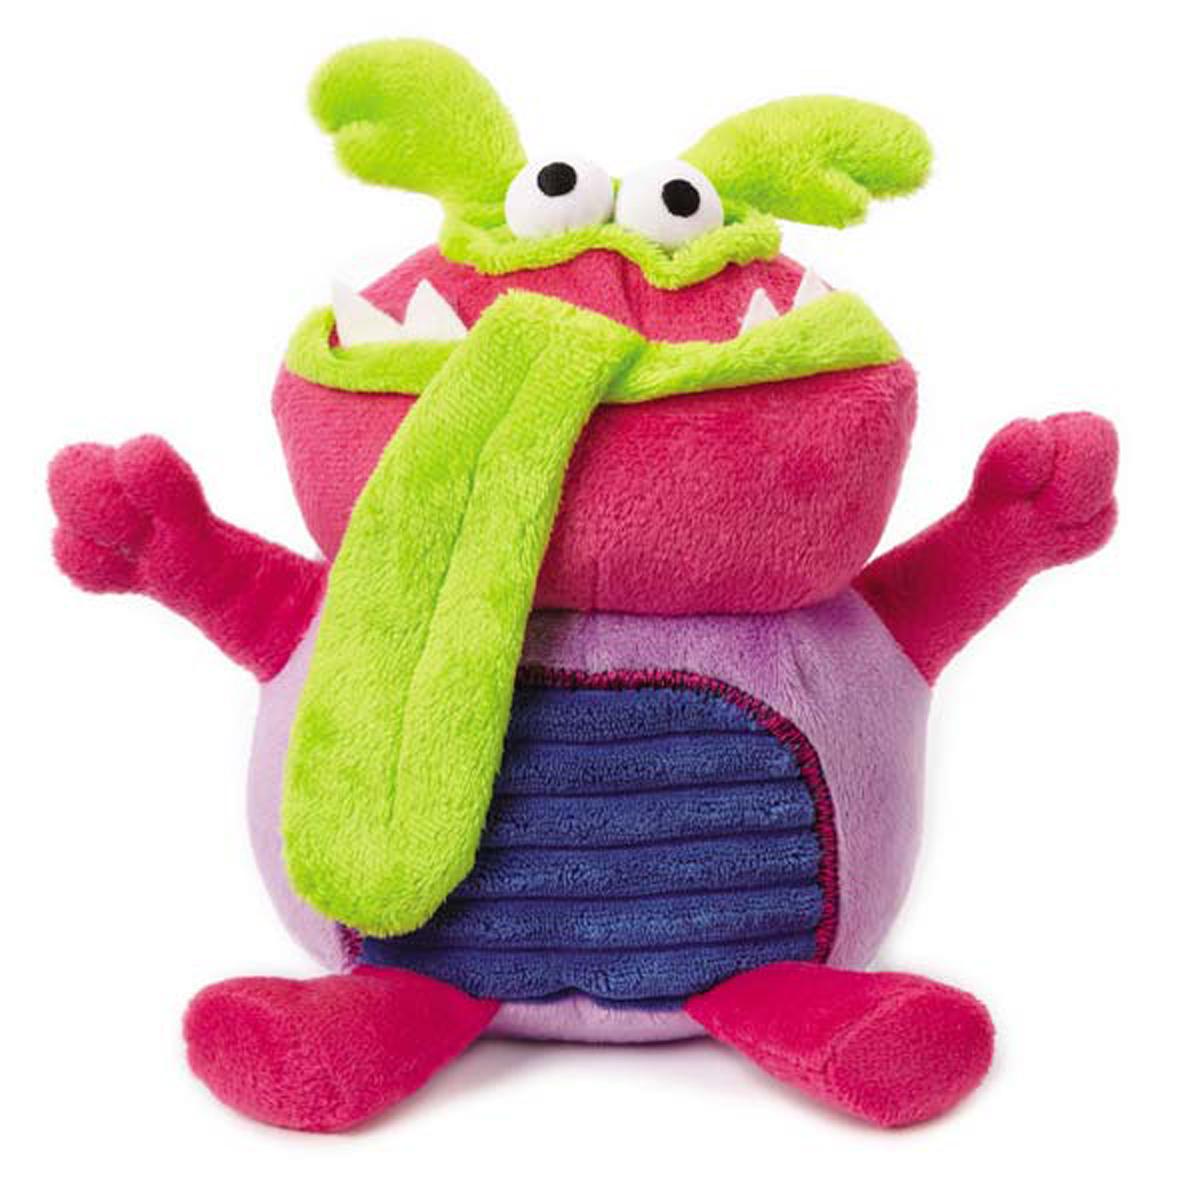 Pink Dog Toy : Grriggles grunting buglies dog toy pink baxterboo